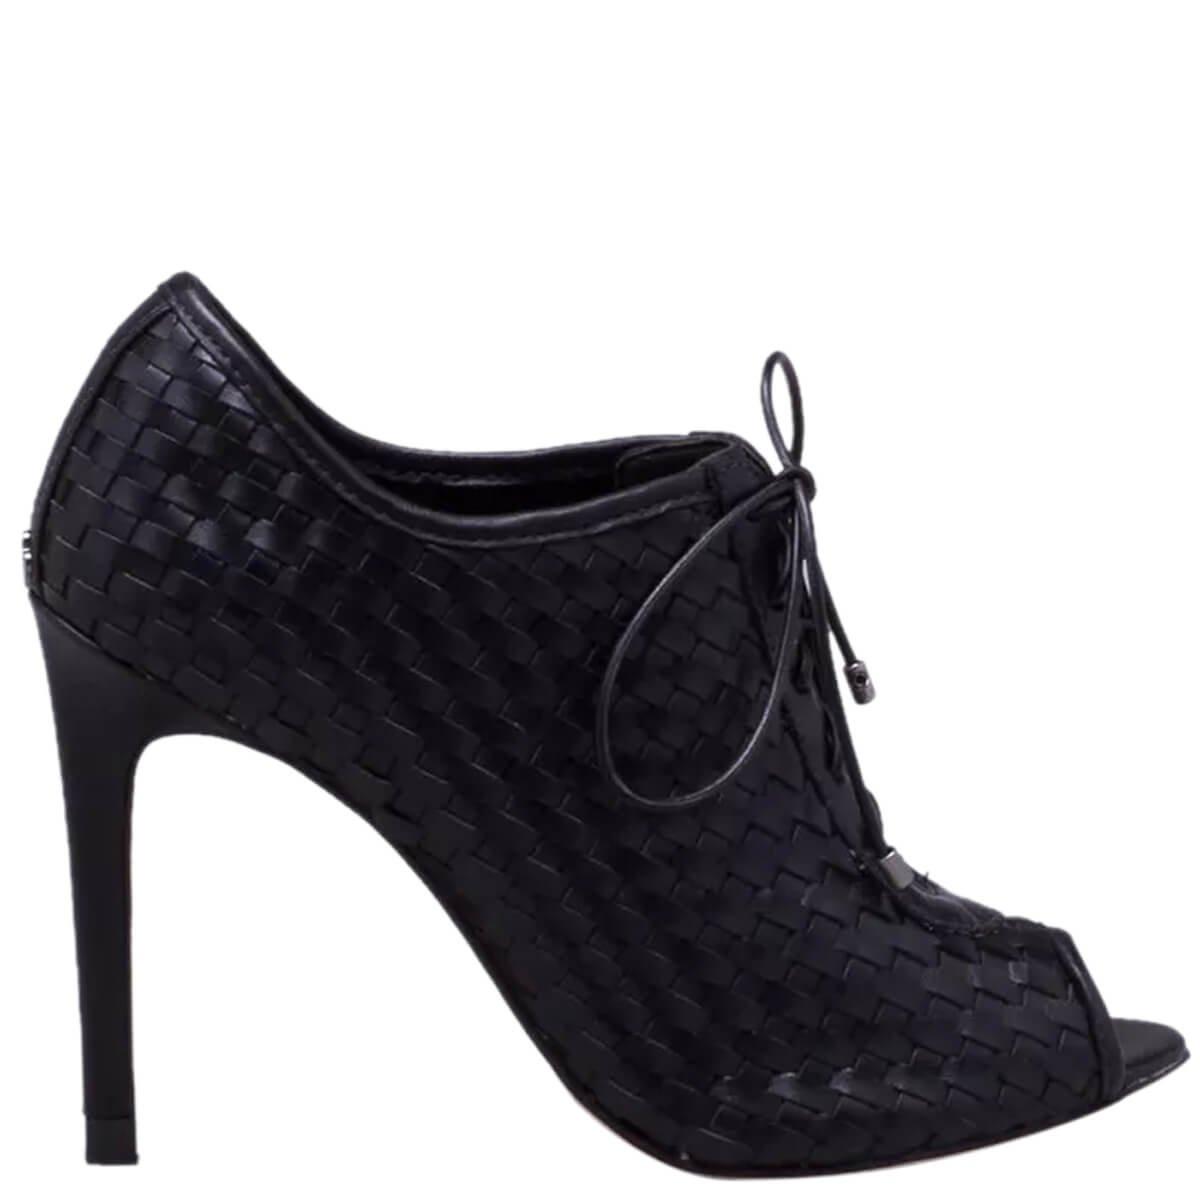 b2b07fed7 Bizz Store - Ankle Boot Feminina Capodarte Soft Work